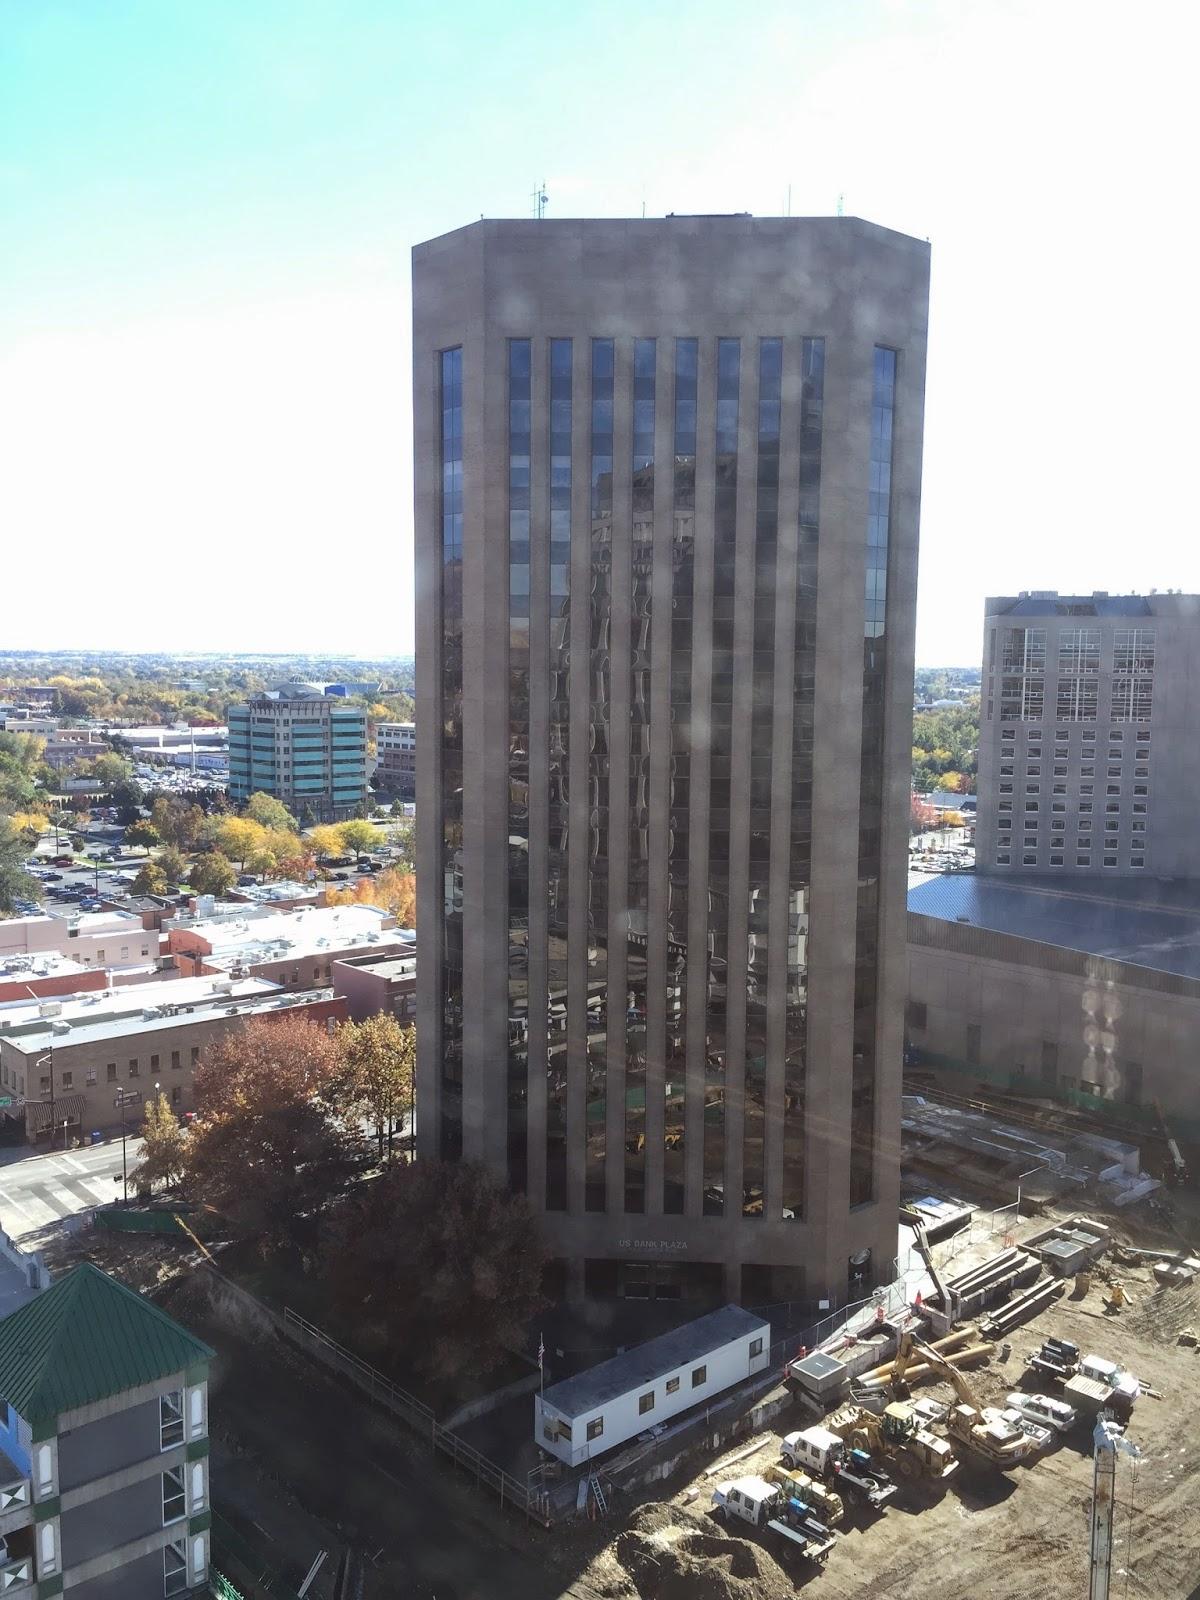 Runstairs tallest building in idaho zions bank stair run for 13th floor in buildings